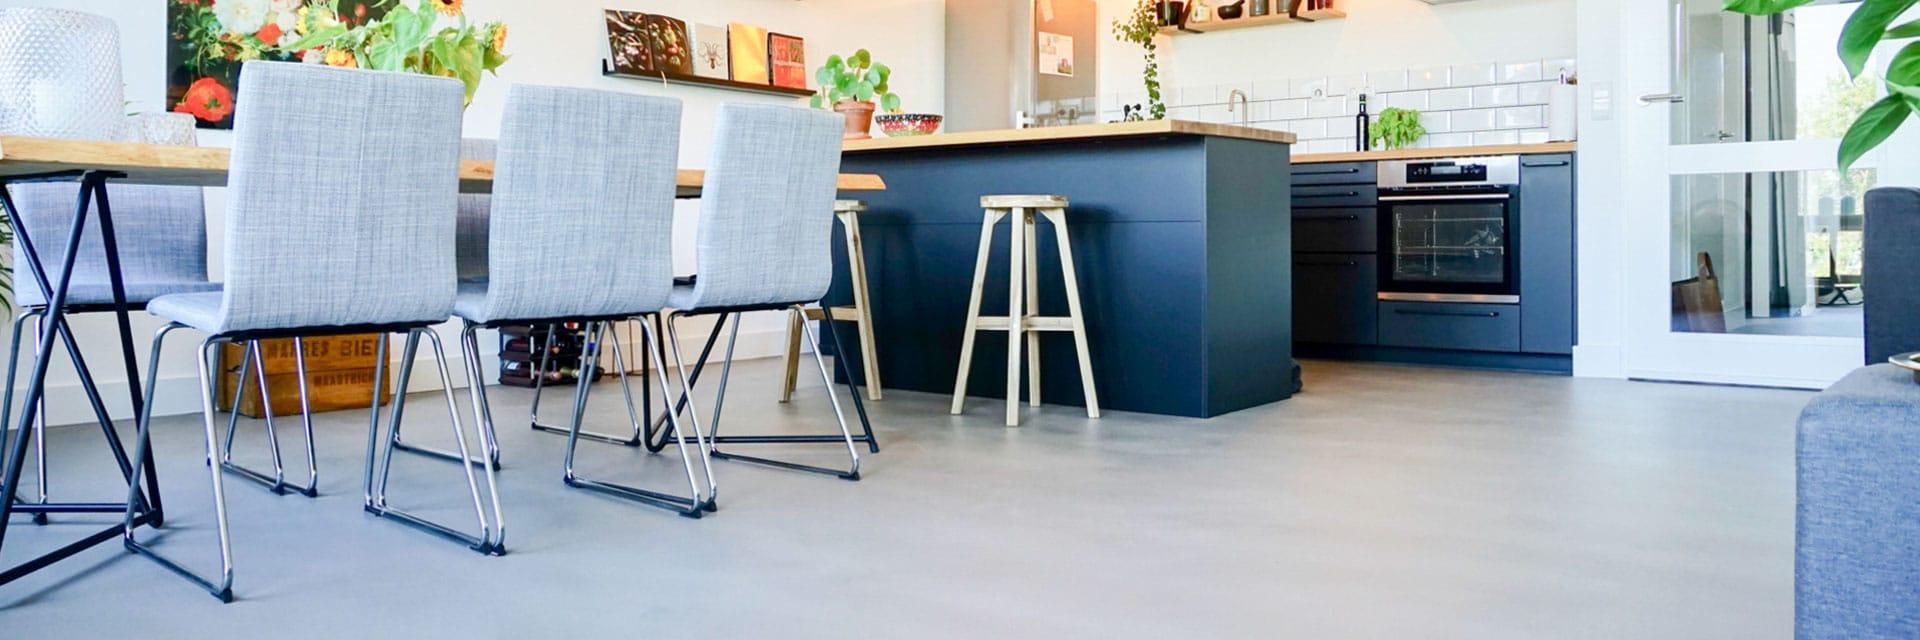 Verschil gietvloer en betonvloer